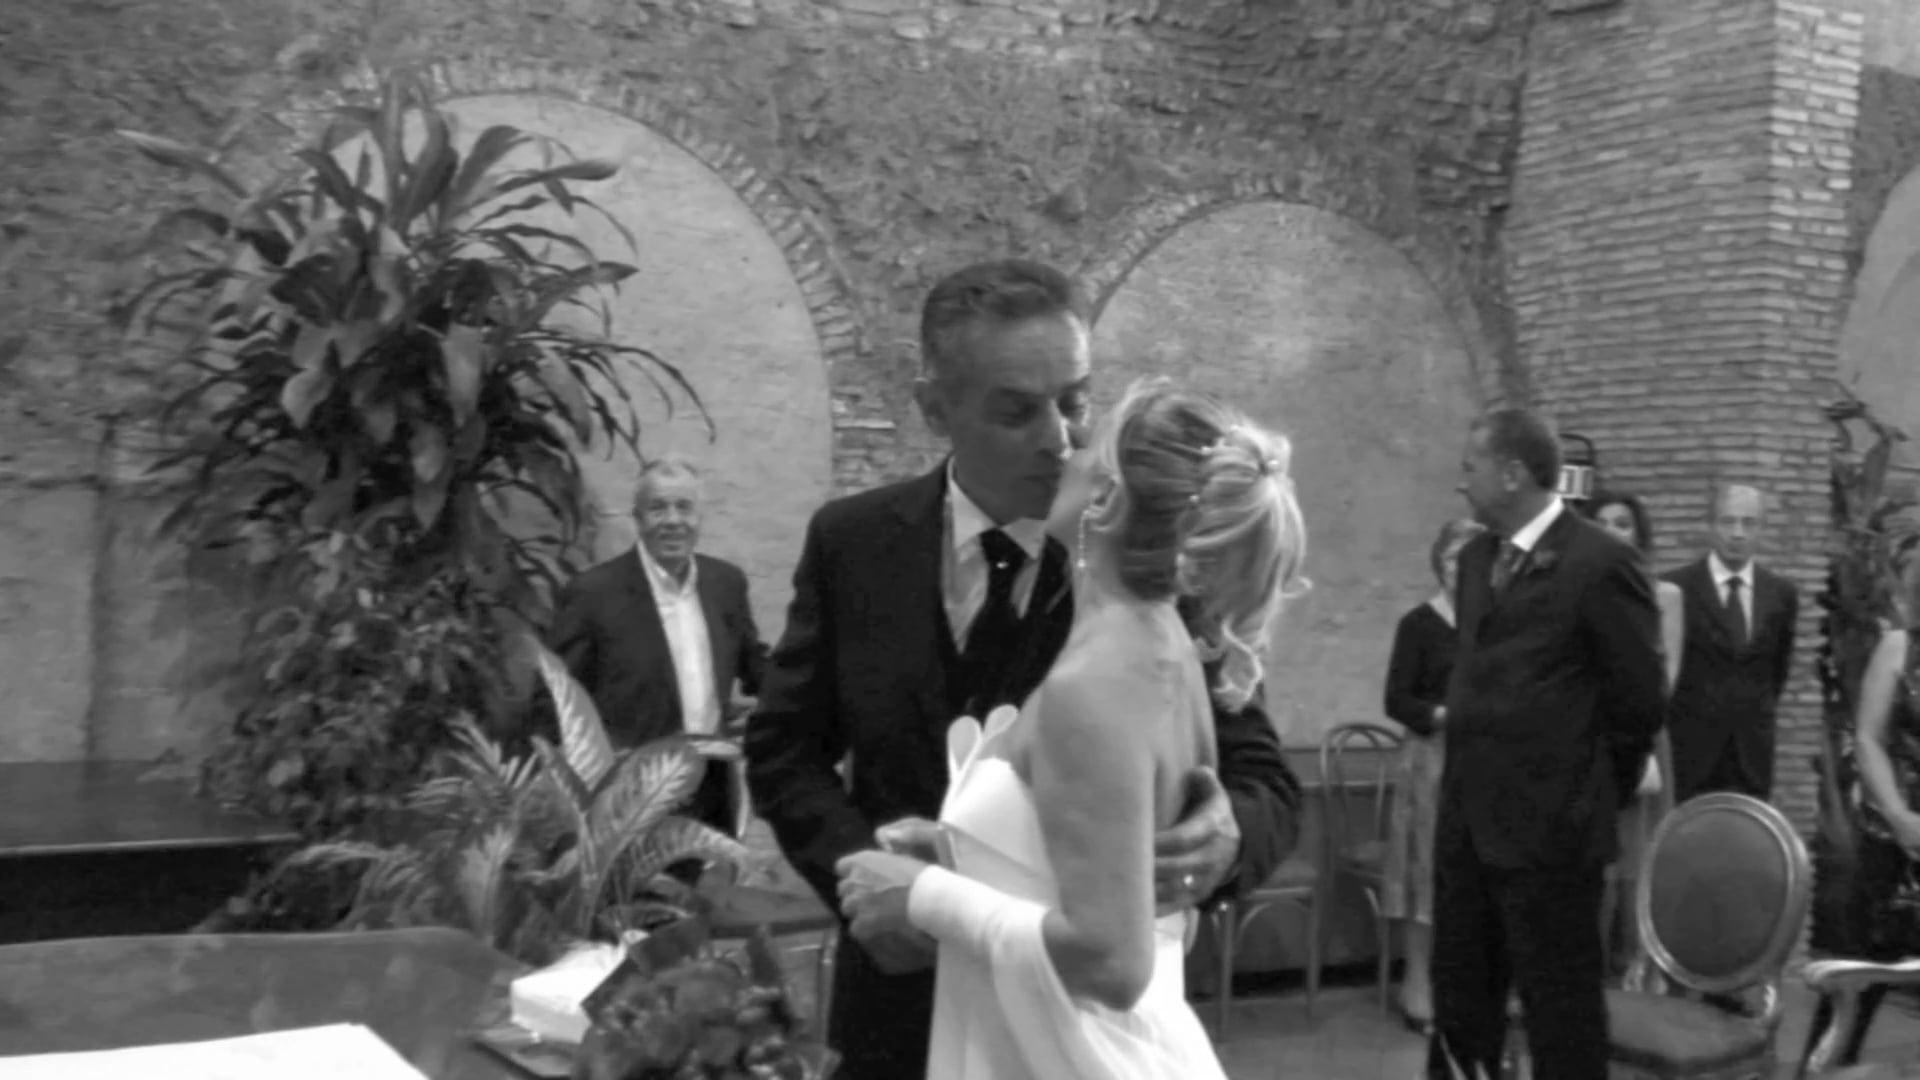 Matrimonio - Highlights3